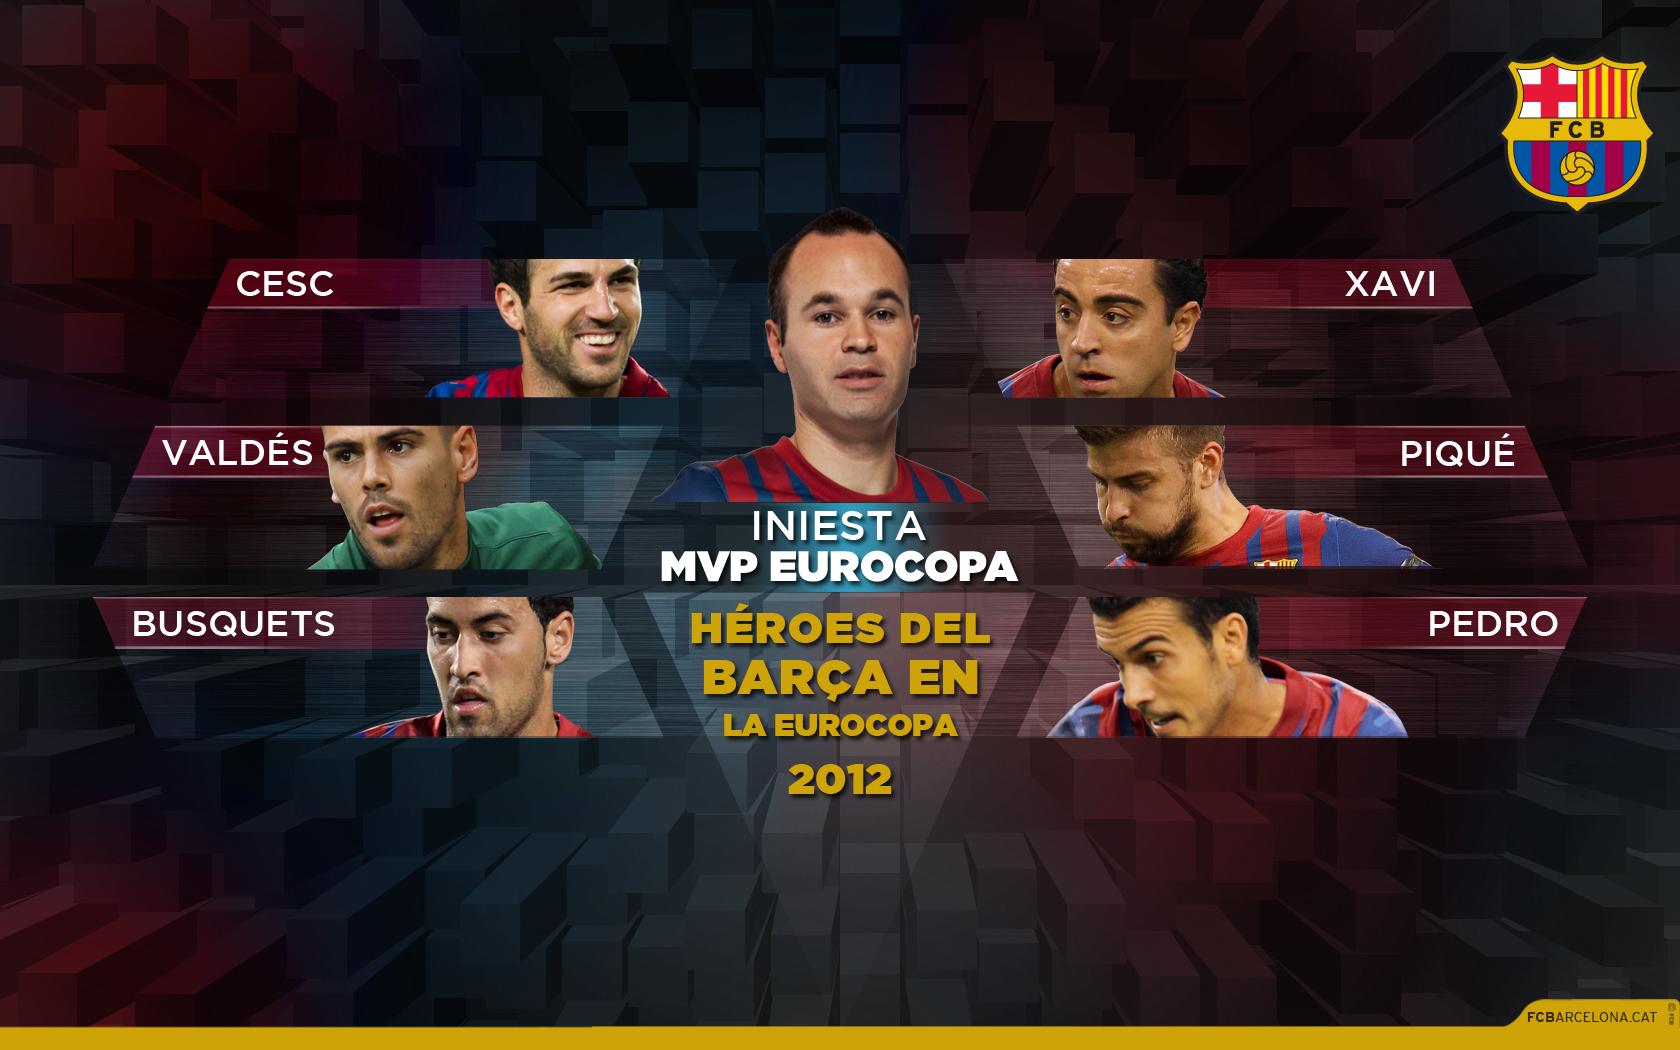 Fondos De Pantalla Camp Nou España El Fc Barcelona: Fondos De Pantalla Especiales